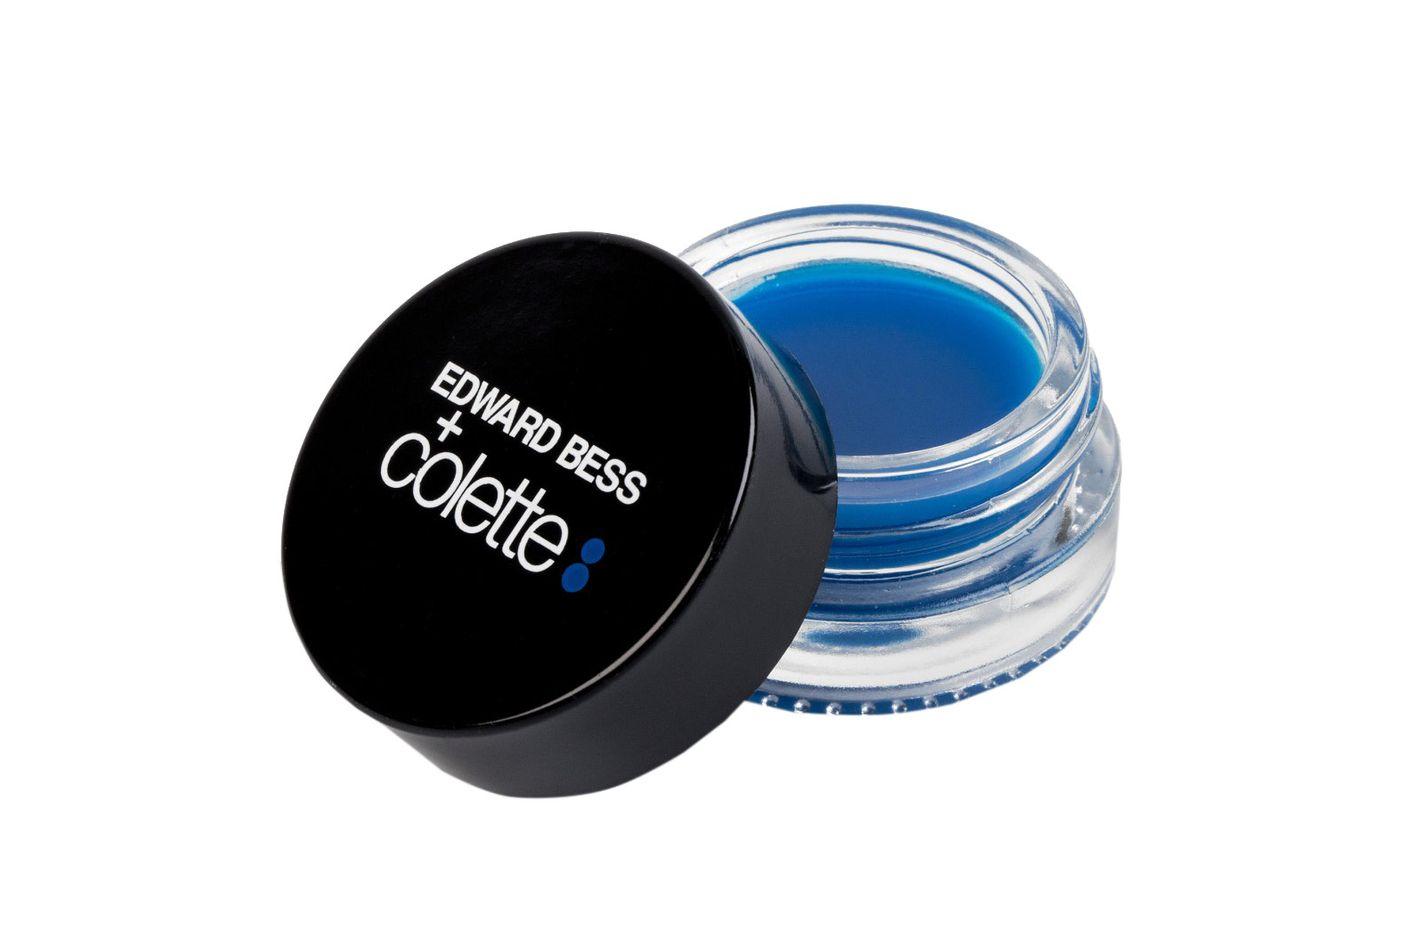 Edward Bess x Colette Blue Balm